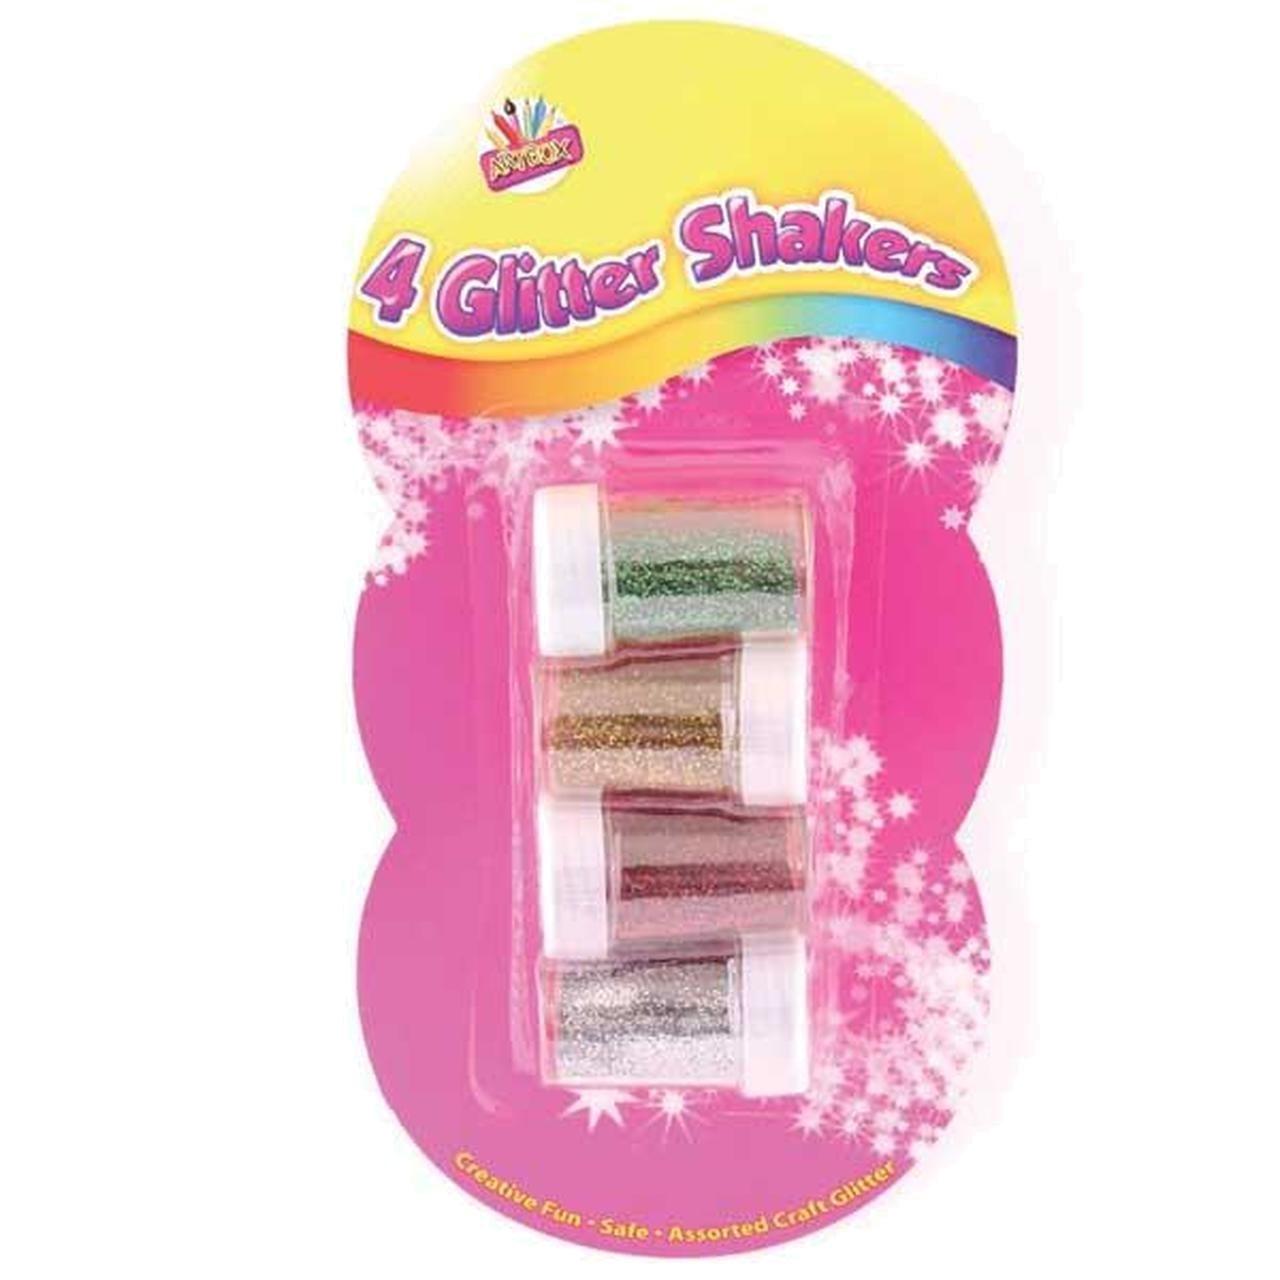 4 GLITTER SHAKERS